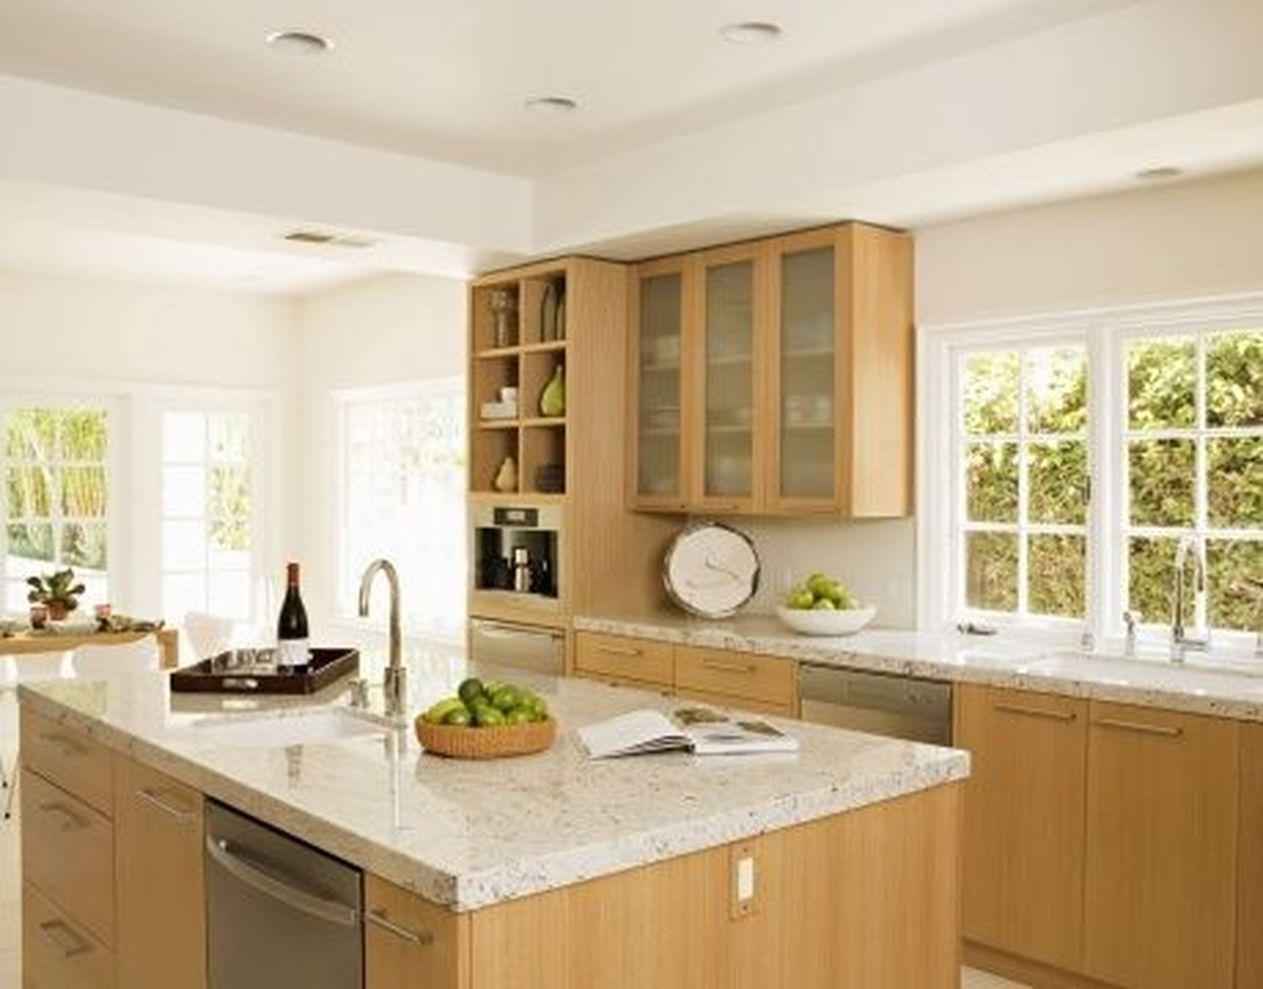 90+ Best Ideas Quartz Kitchen Countertops | Quartz kitchen ... on Maple Kitchen Cabinets With Quartz Countertops  id=73828